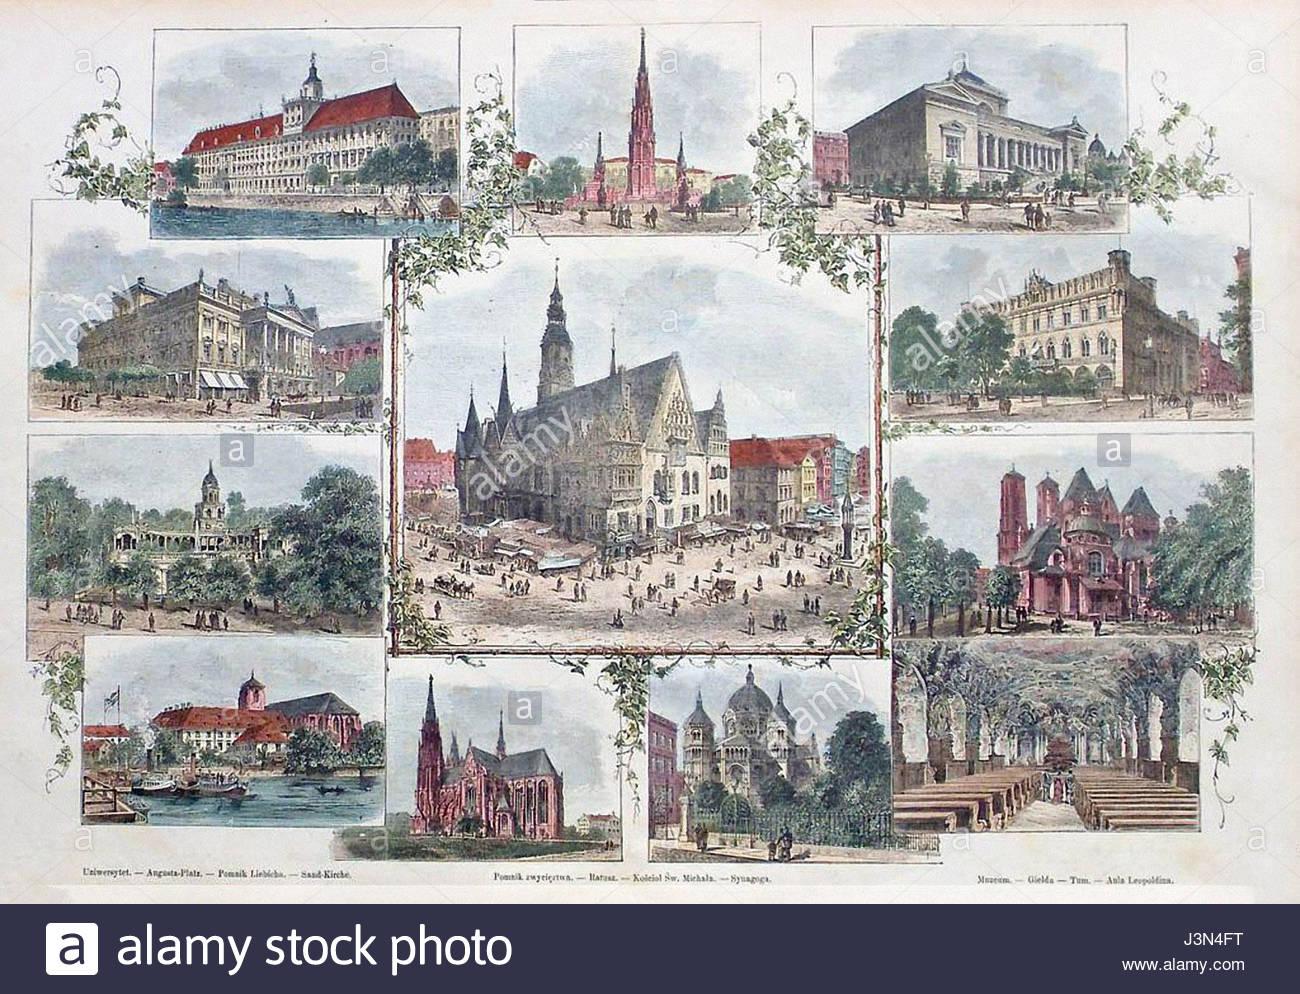 https://c8.alamy.com/comp/J3N4FT/german-city-breslau-wroclaw-on-vintage-postcard-at-the-turn-of-the-J3N4FT.jpg